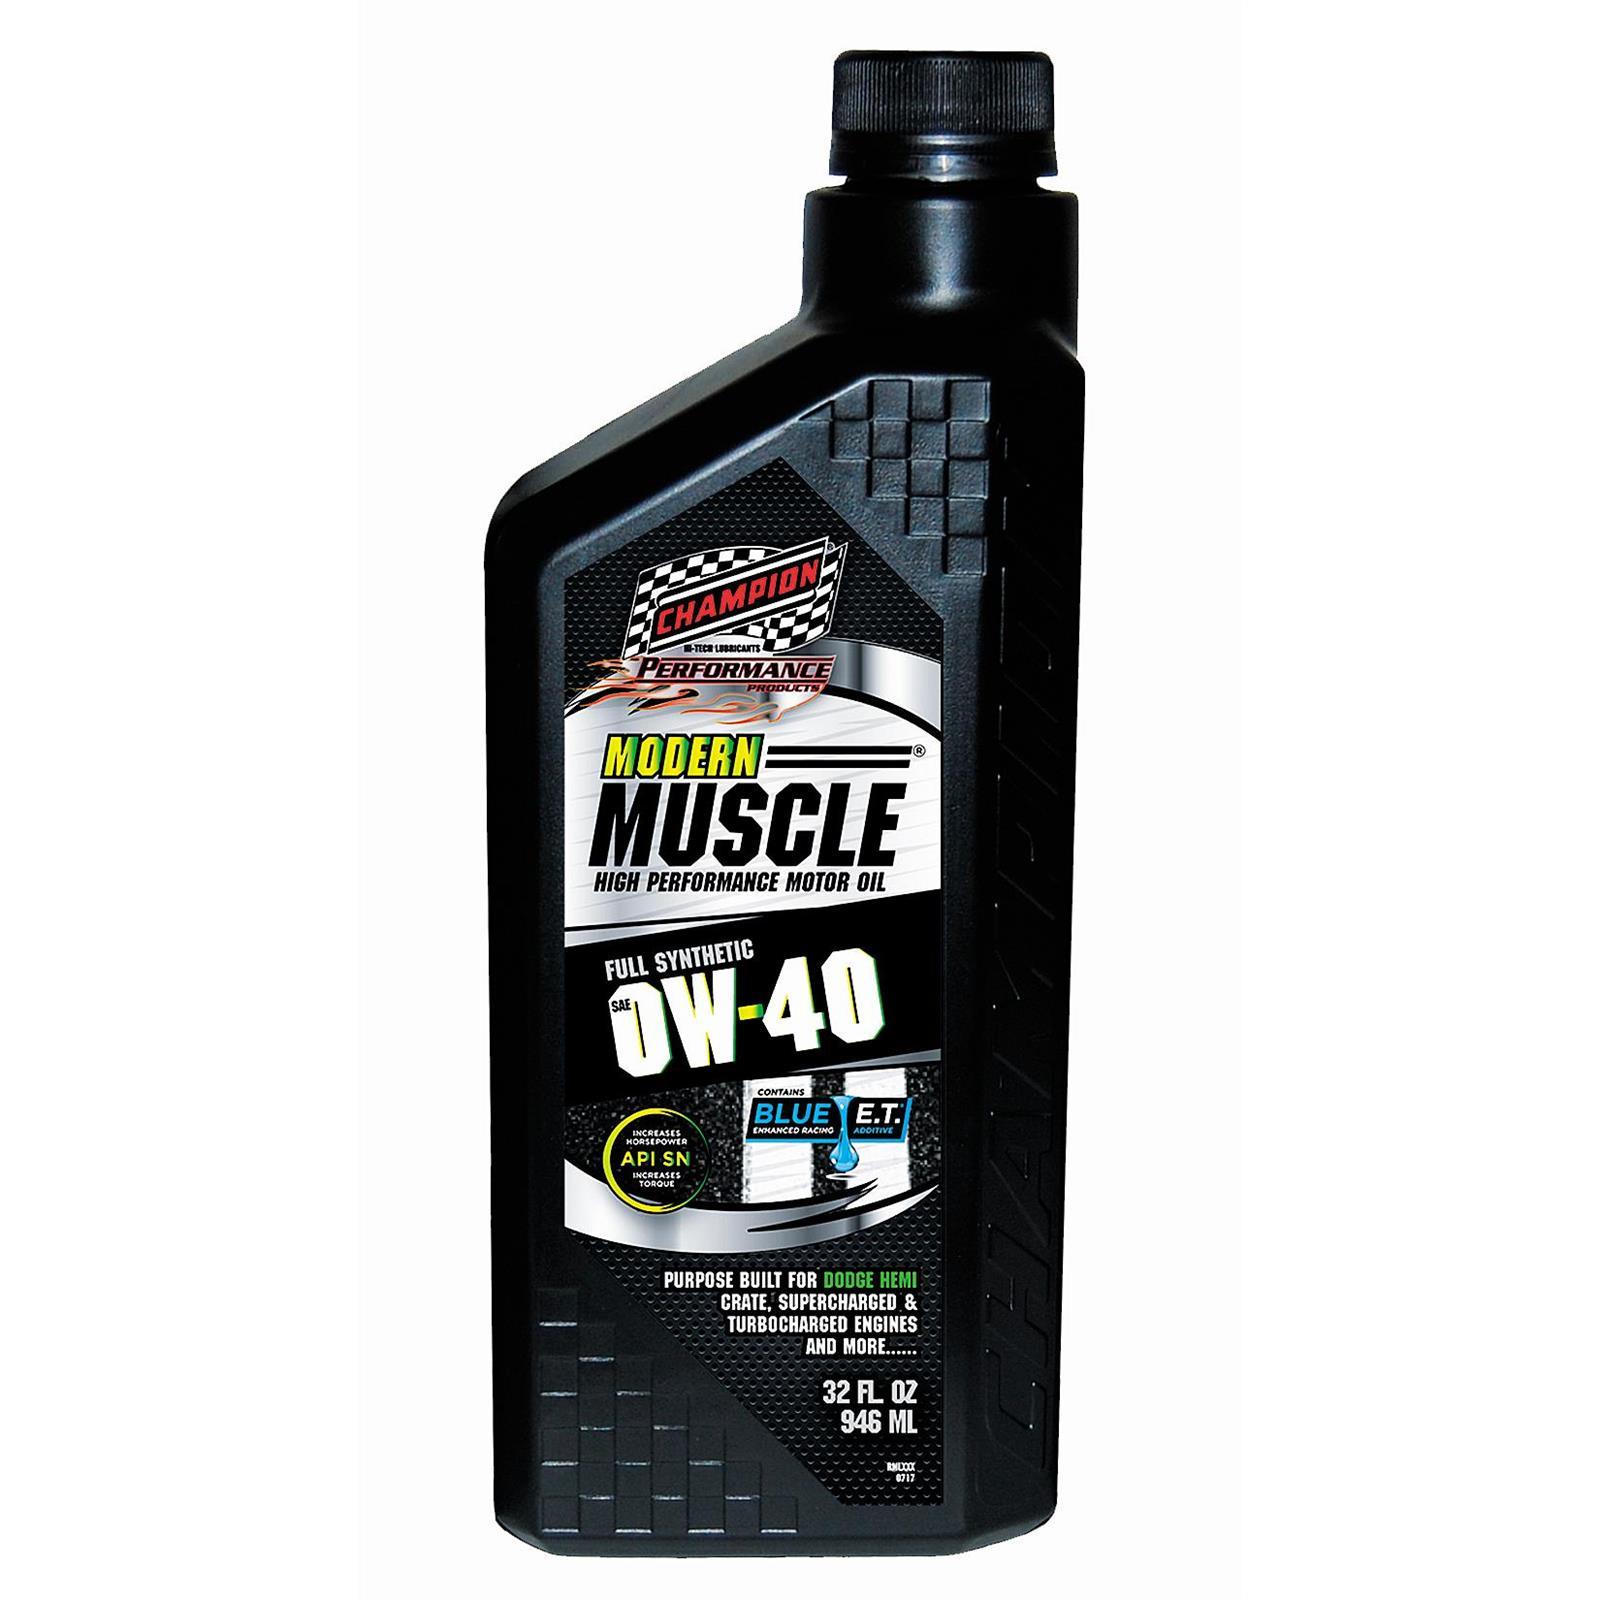 Champion Racing 4402H Modern Muscle Engine Oil, 0W40, 12/1 Quart